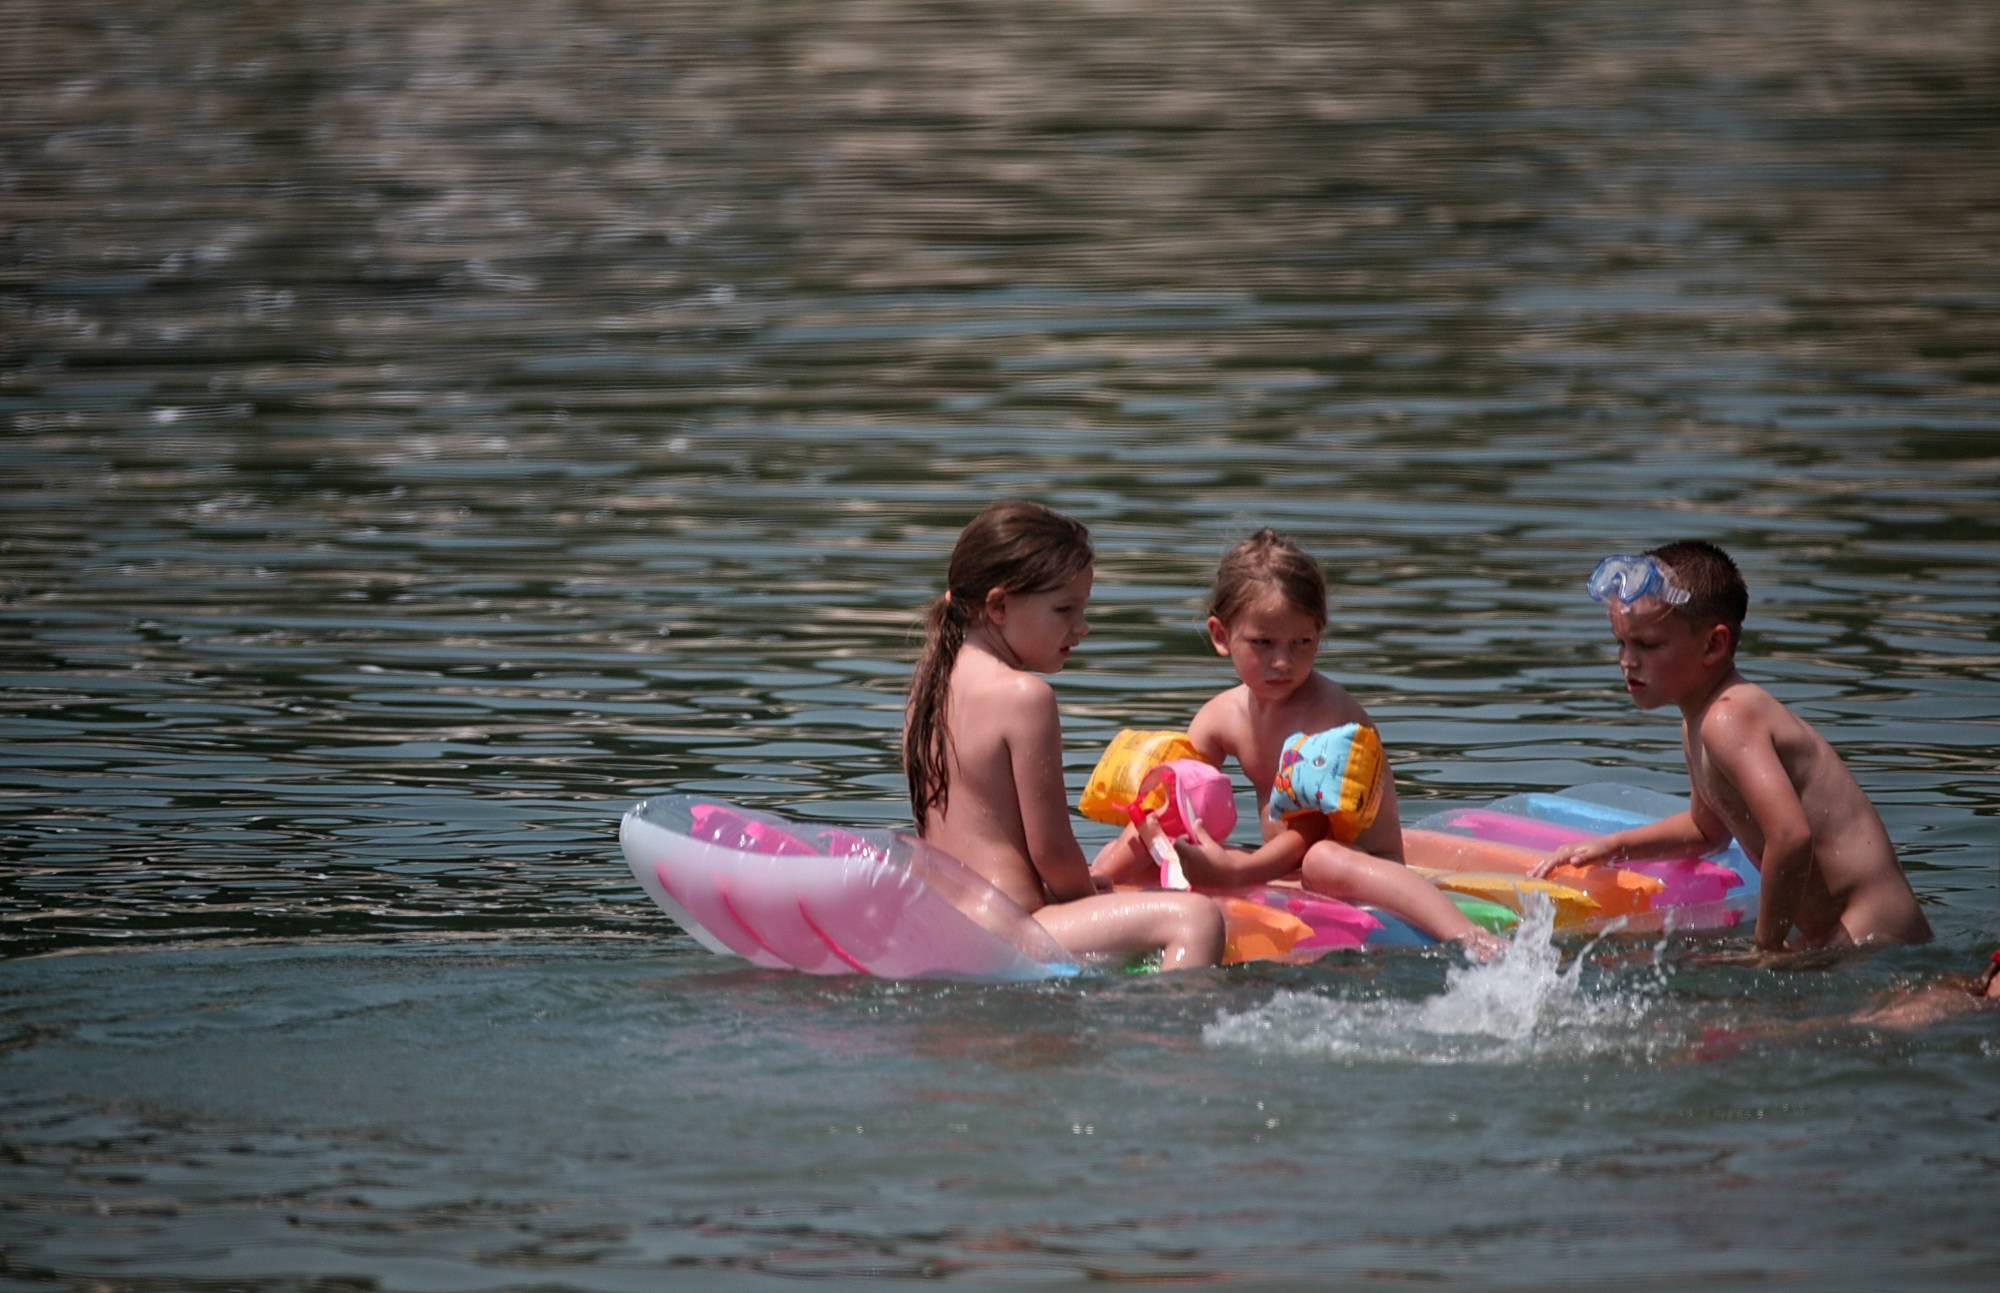 Nudist Pics Relax Aboard A Floaty Raft - 1